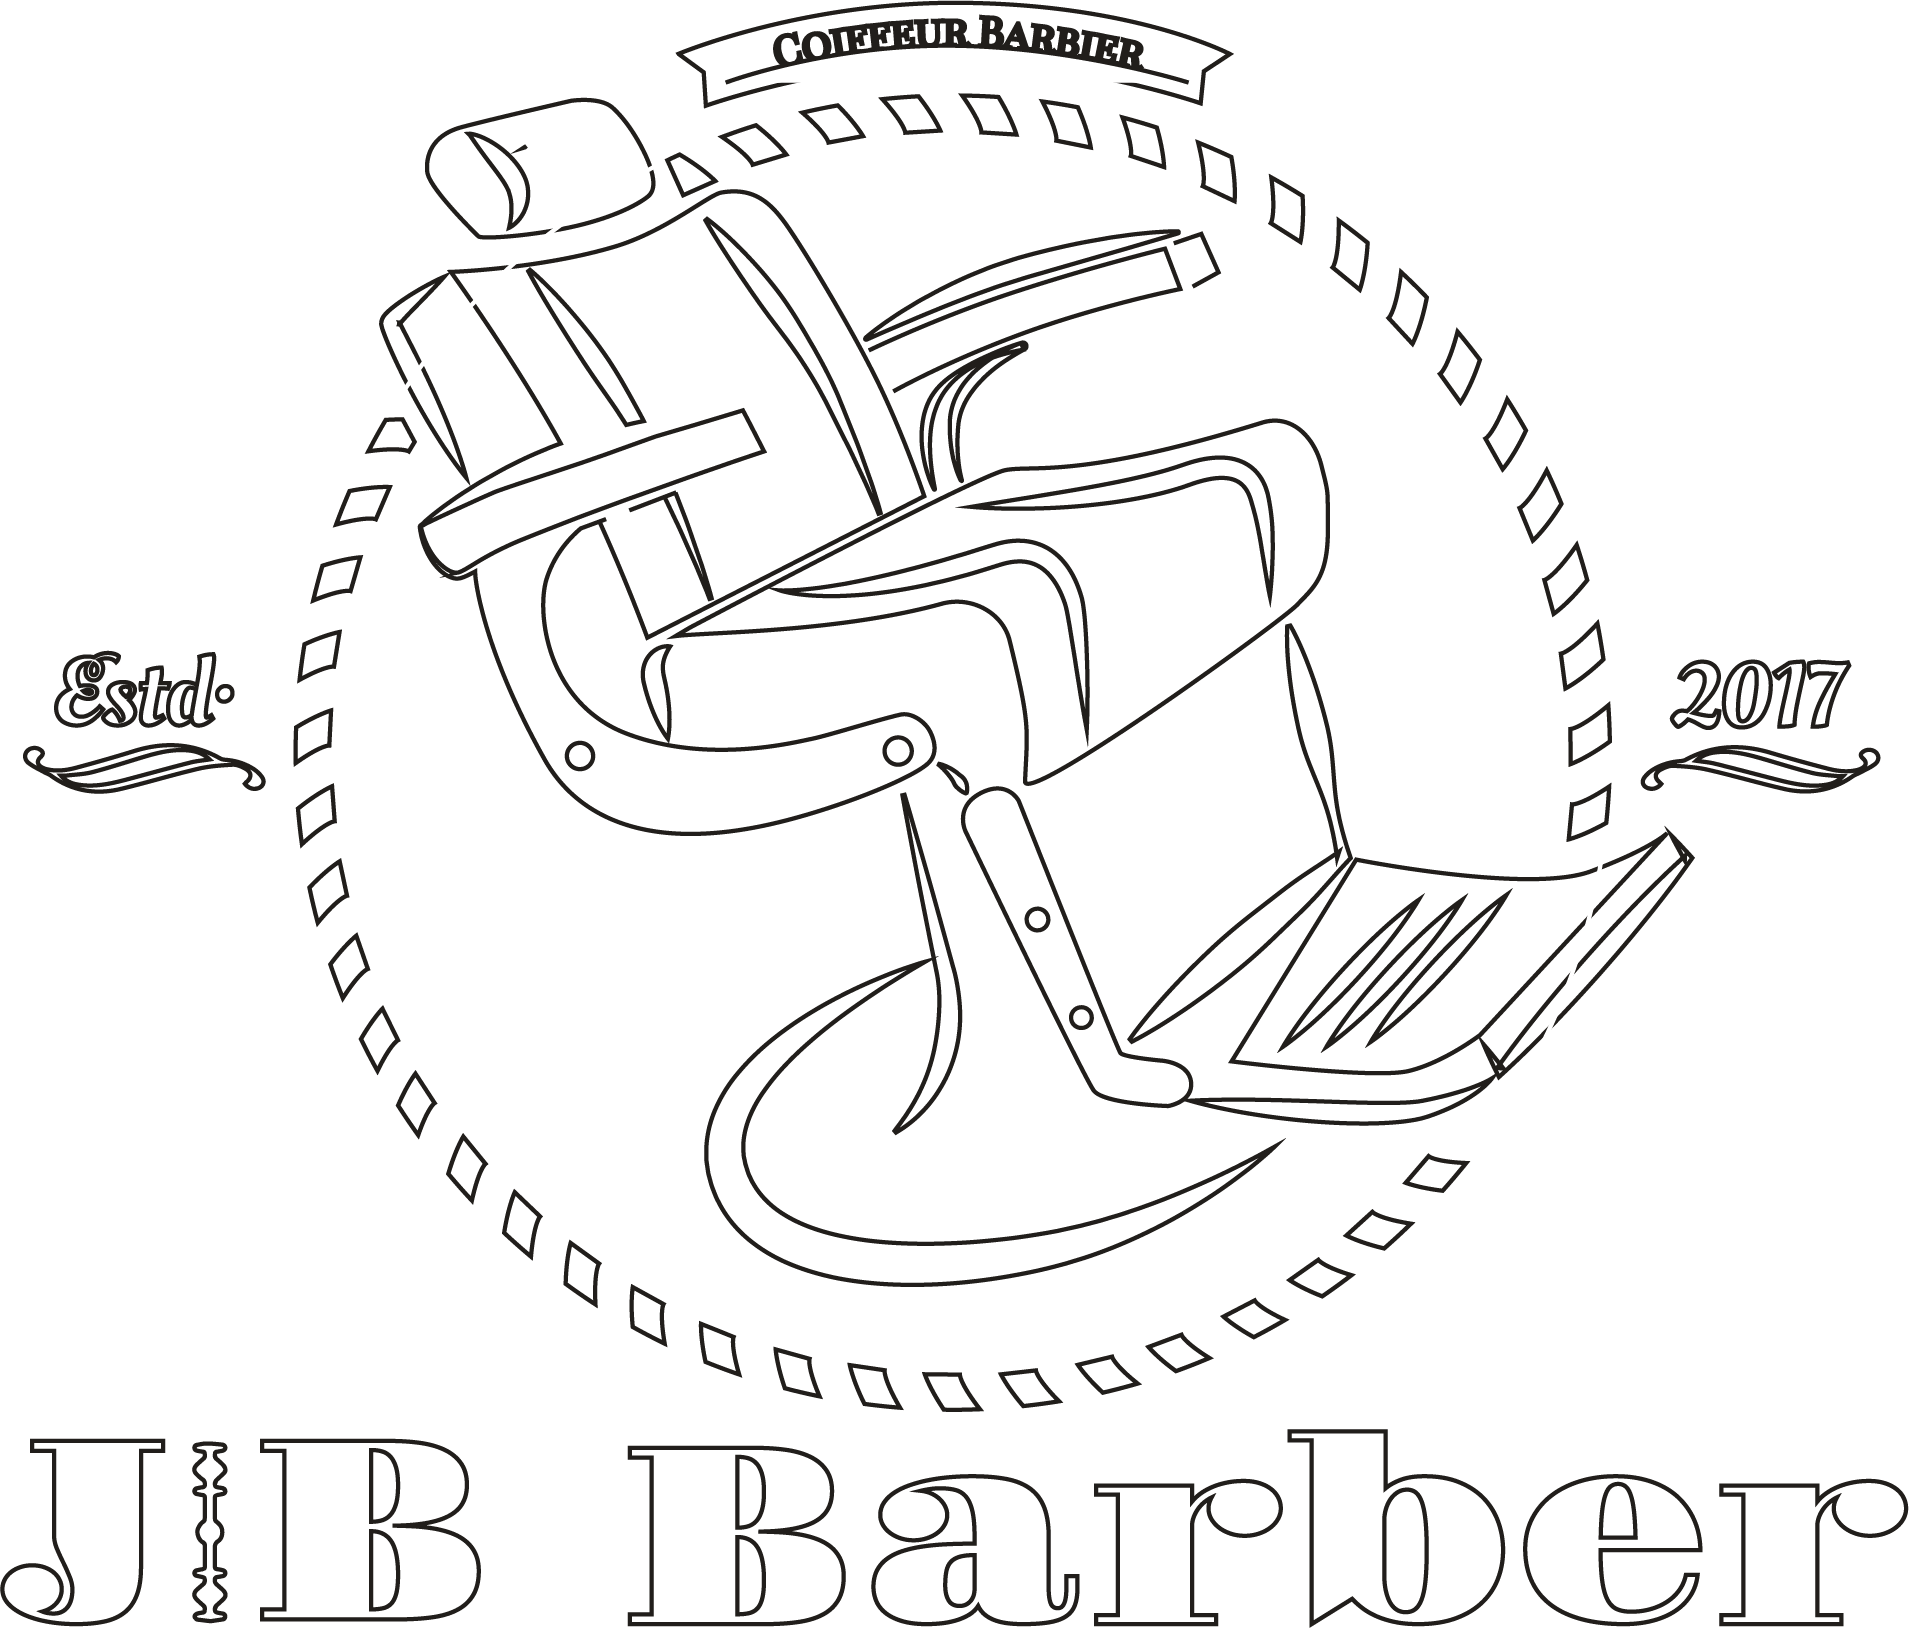 Jbbarber